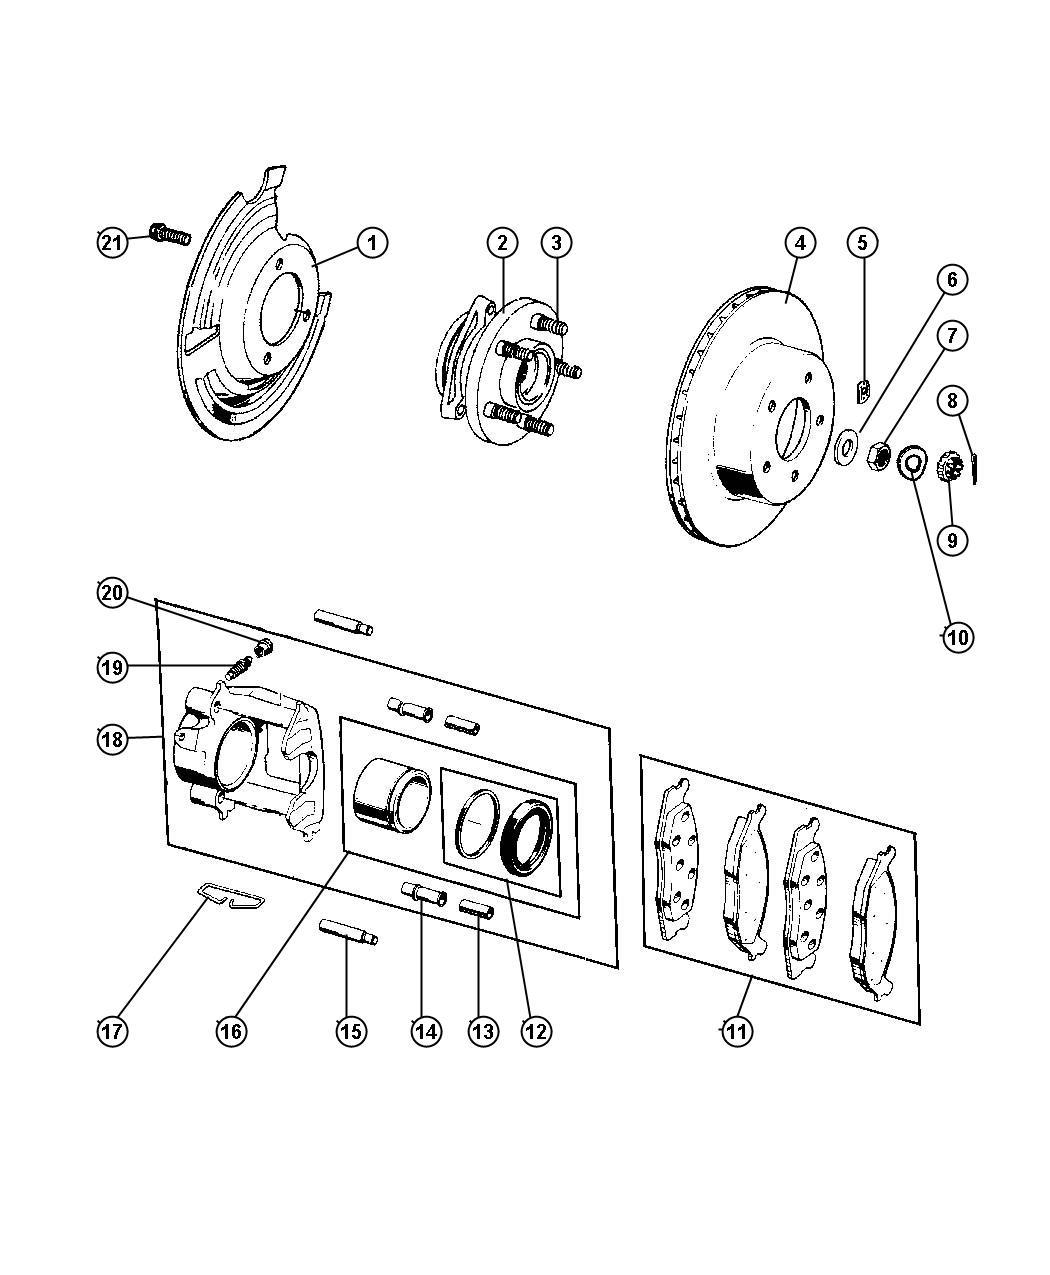 1998 Jeep Grand Cherokee Rotor. Brake. Magneti marelli